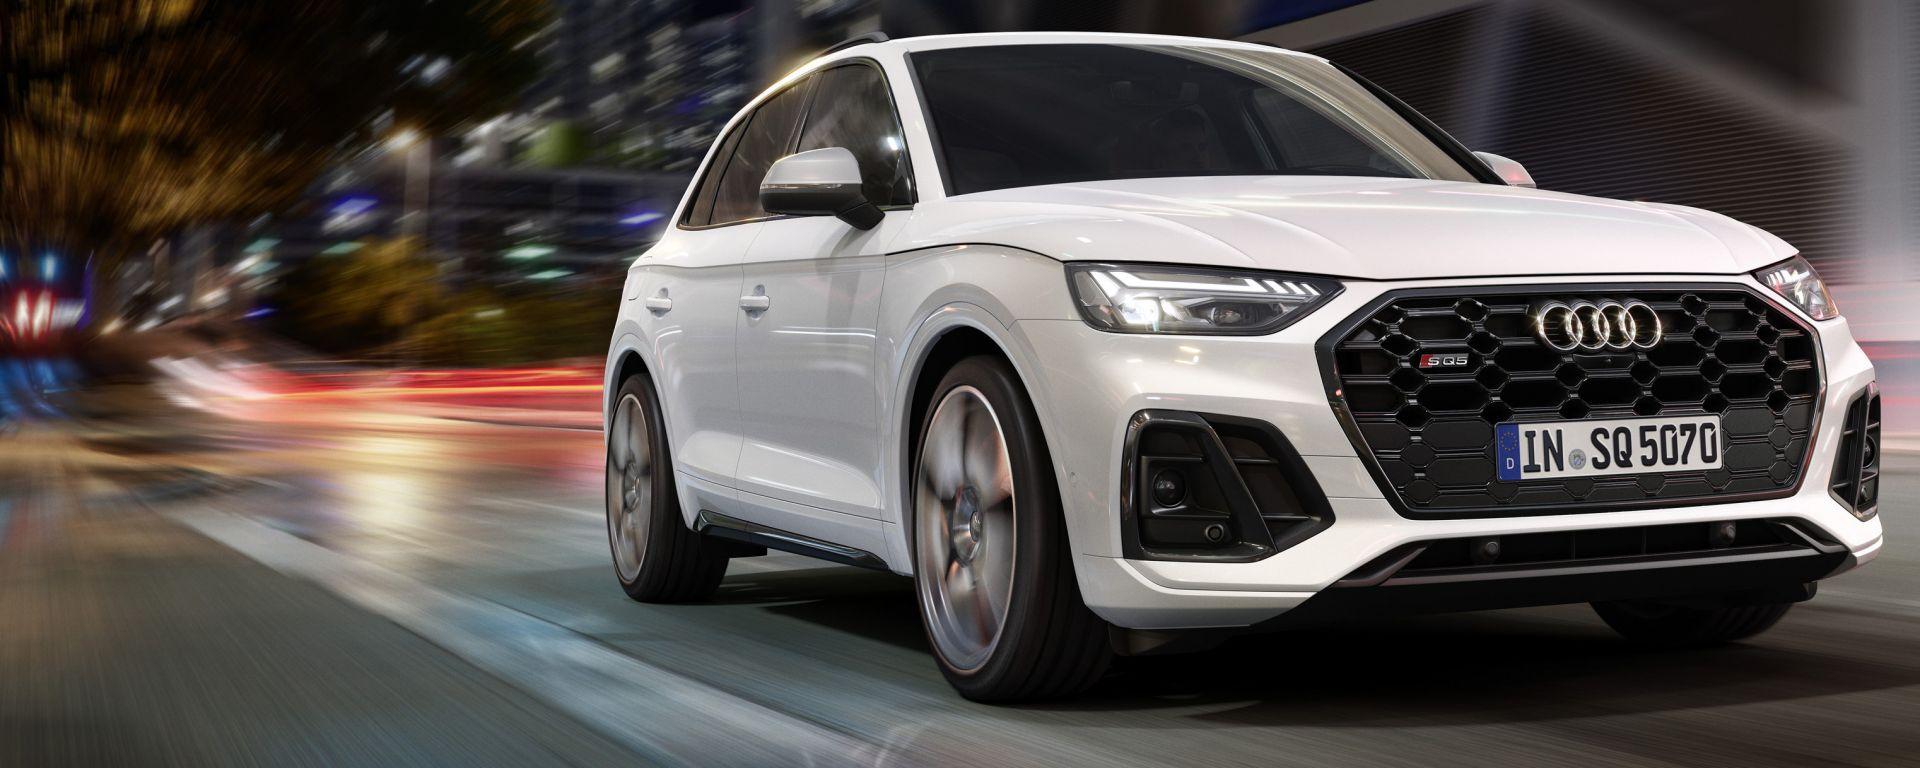 Nuova Audi SQ5 TDI, in Italia ad aprile 2021